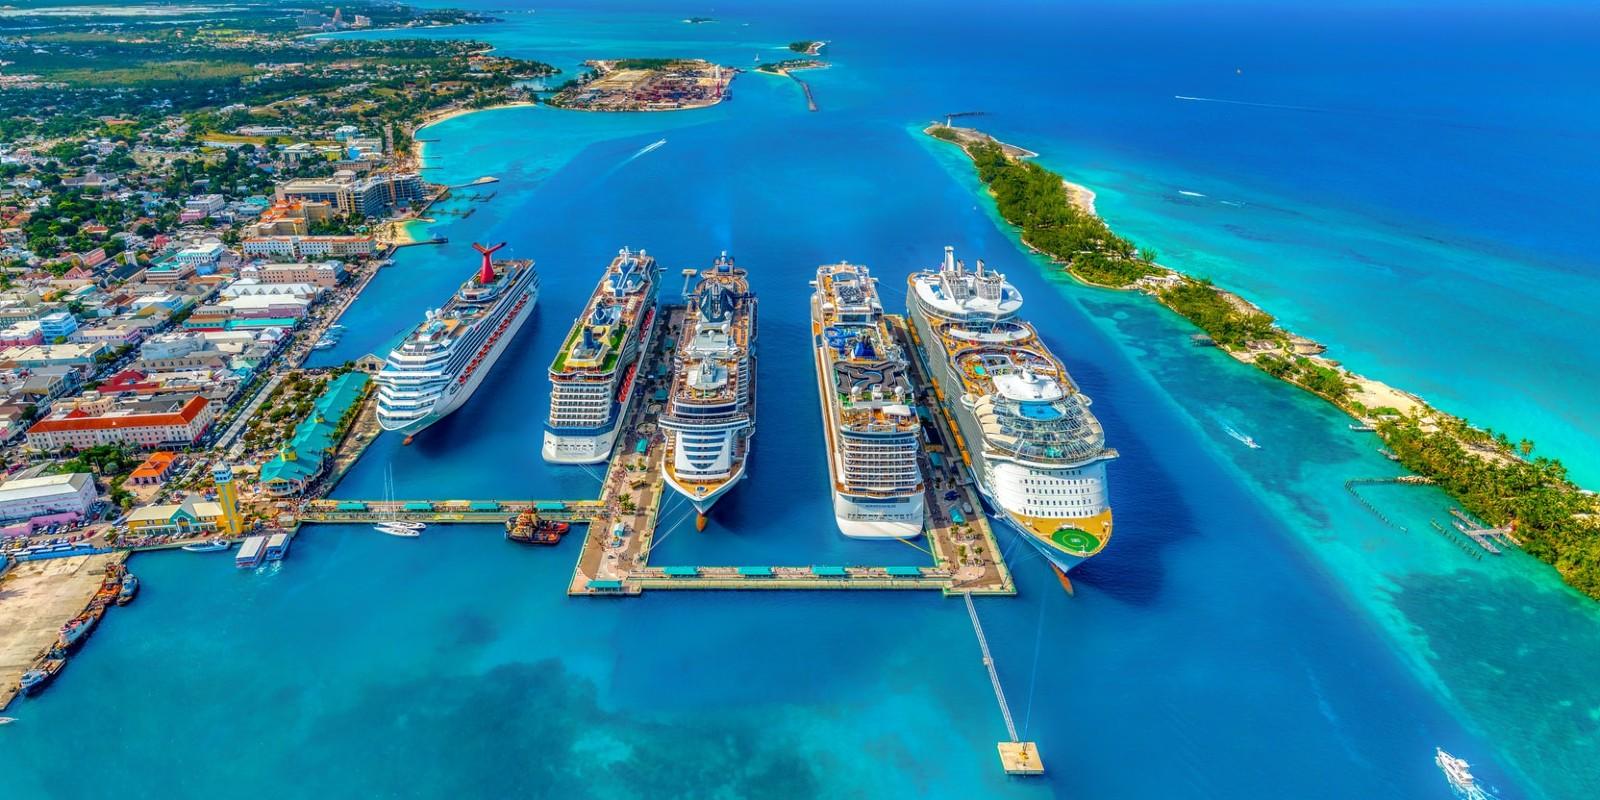 cruise-ships-bahamas